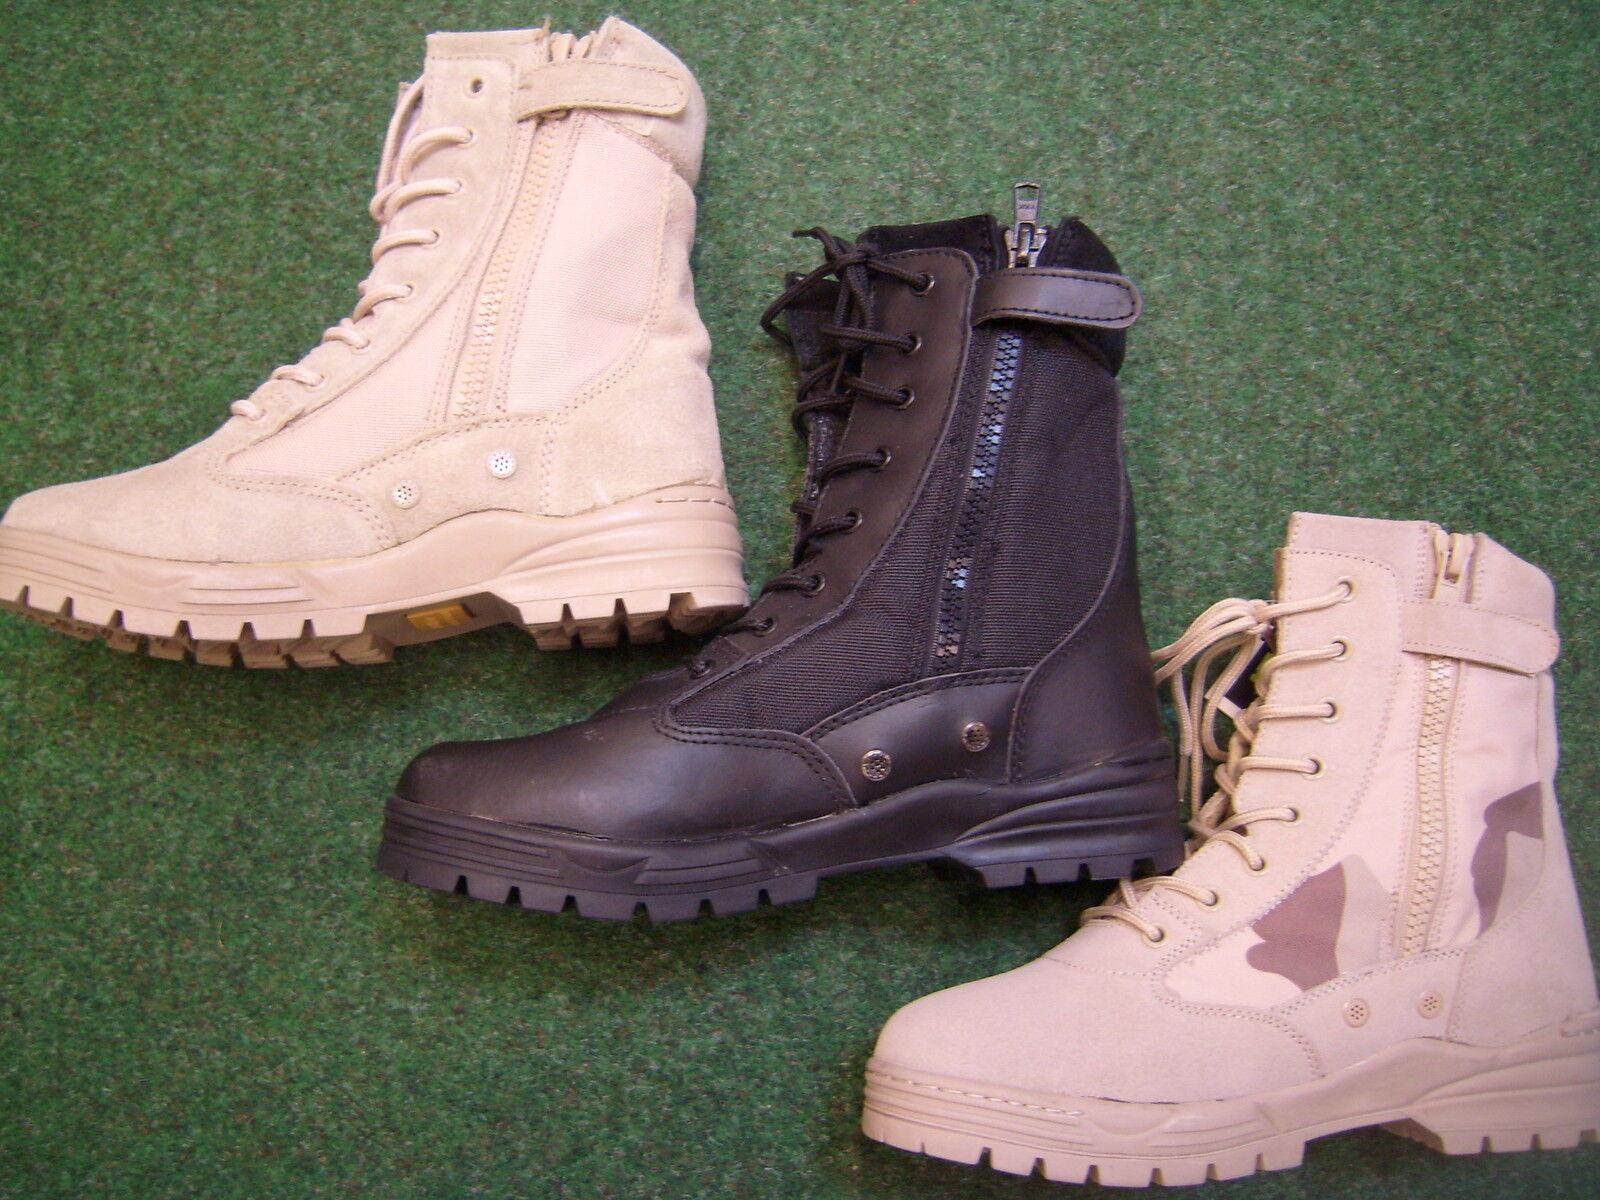 Nuovi stivali da combattimento Patriot Beige neri BW Stivali da lavgold esterno